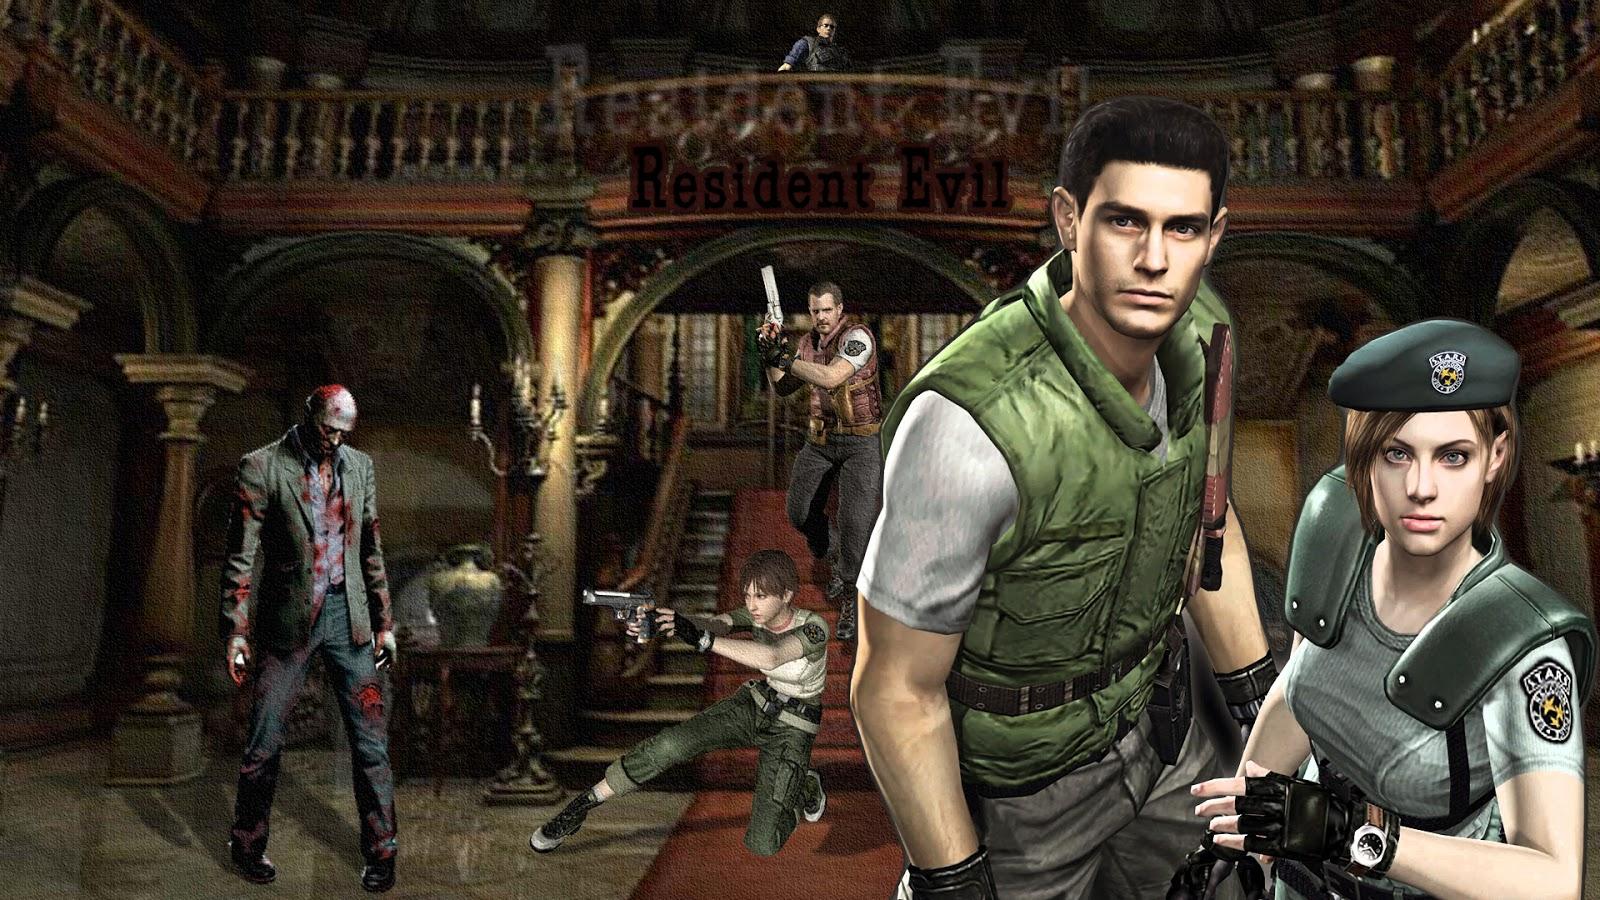 Sinopsis Game Resident Evil 1 Timeline 1998 A Footprints